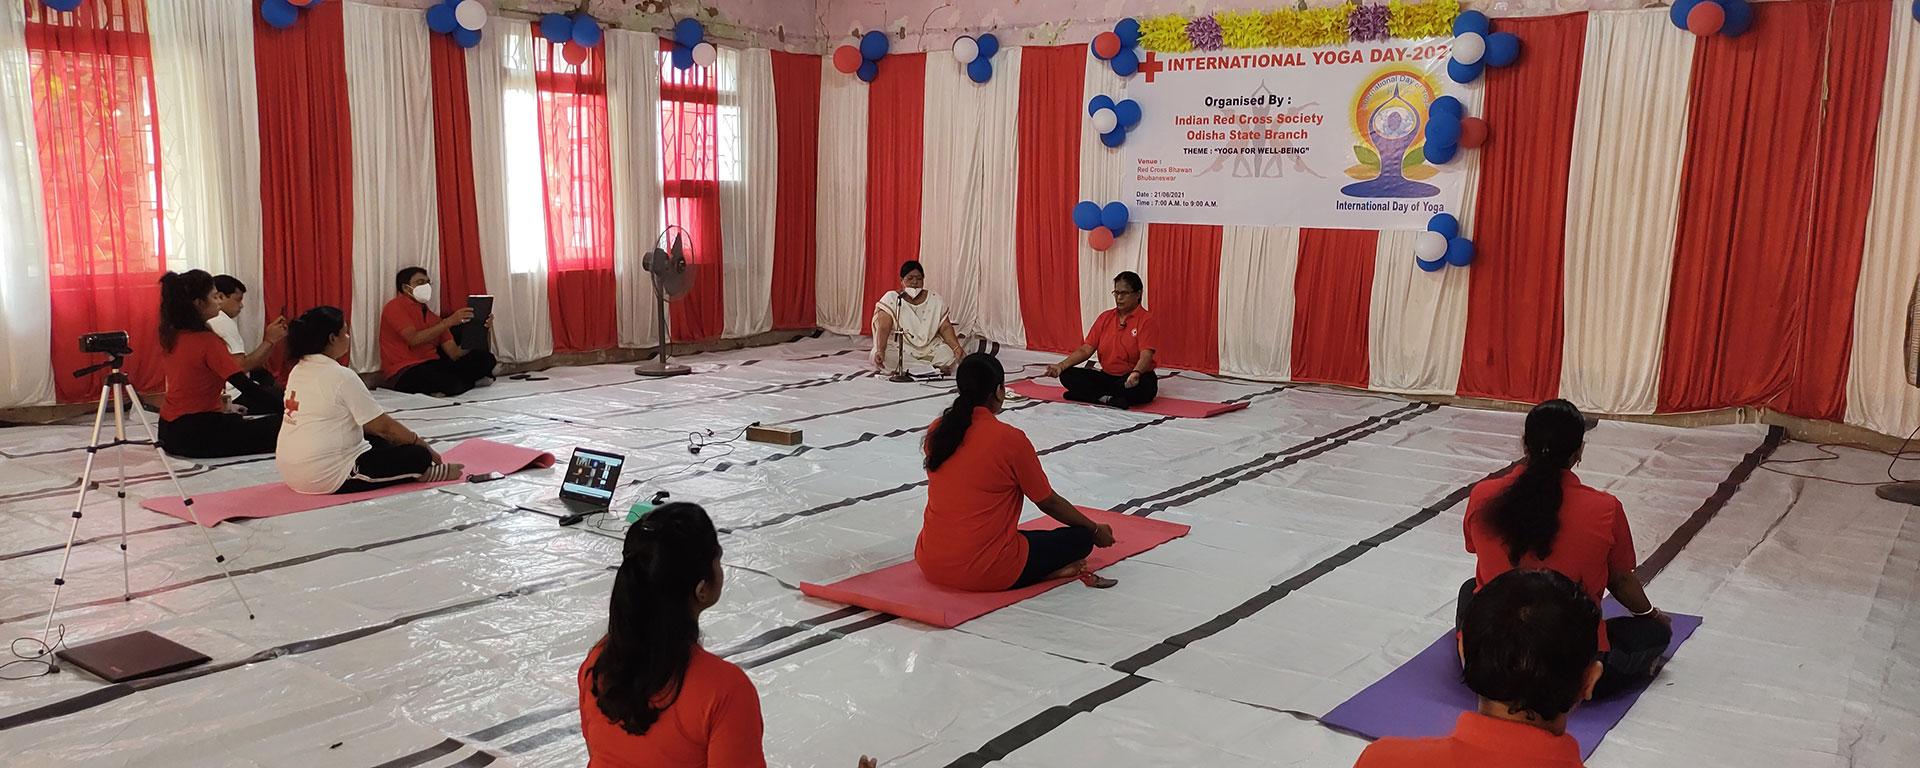 banner-yoga-day